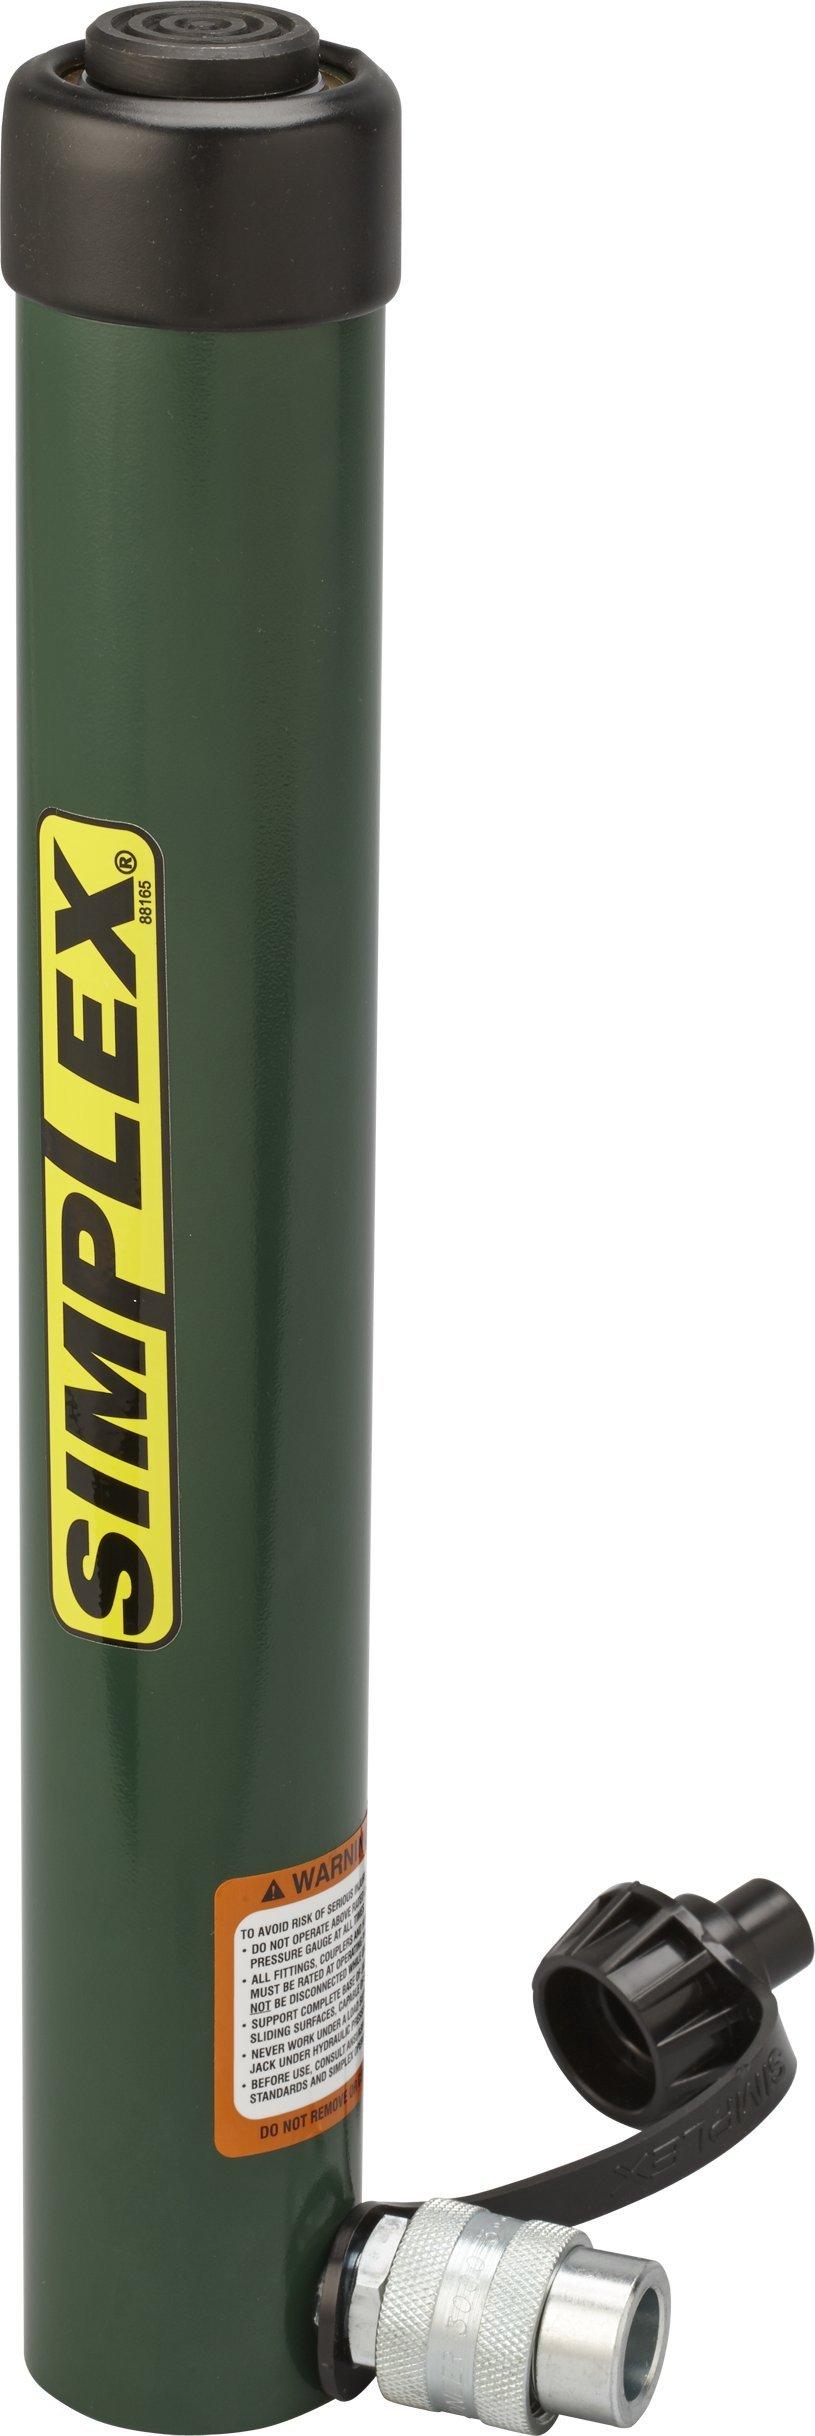 Simplex R1010 Steel Spring Return Cylinder, 8929 PSI, 2.24'' Bore, 10'' Stroke